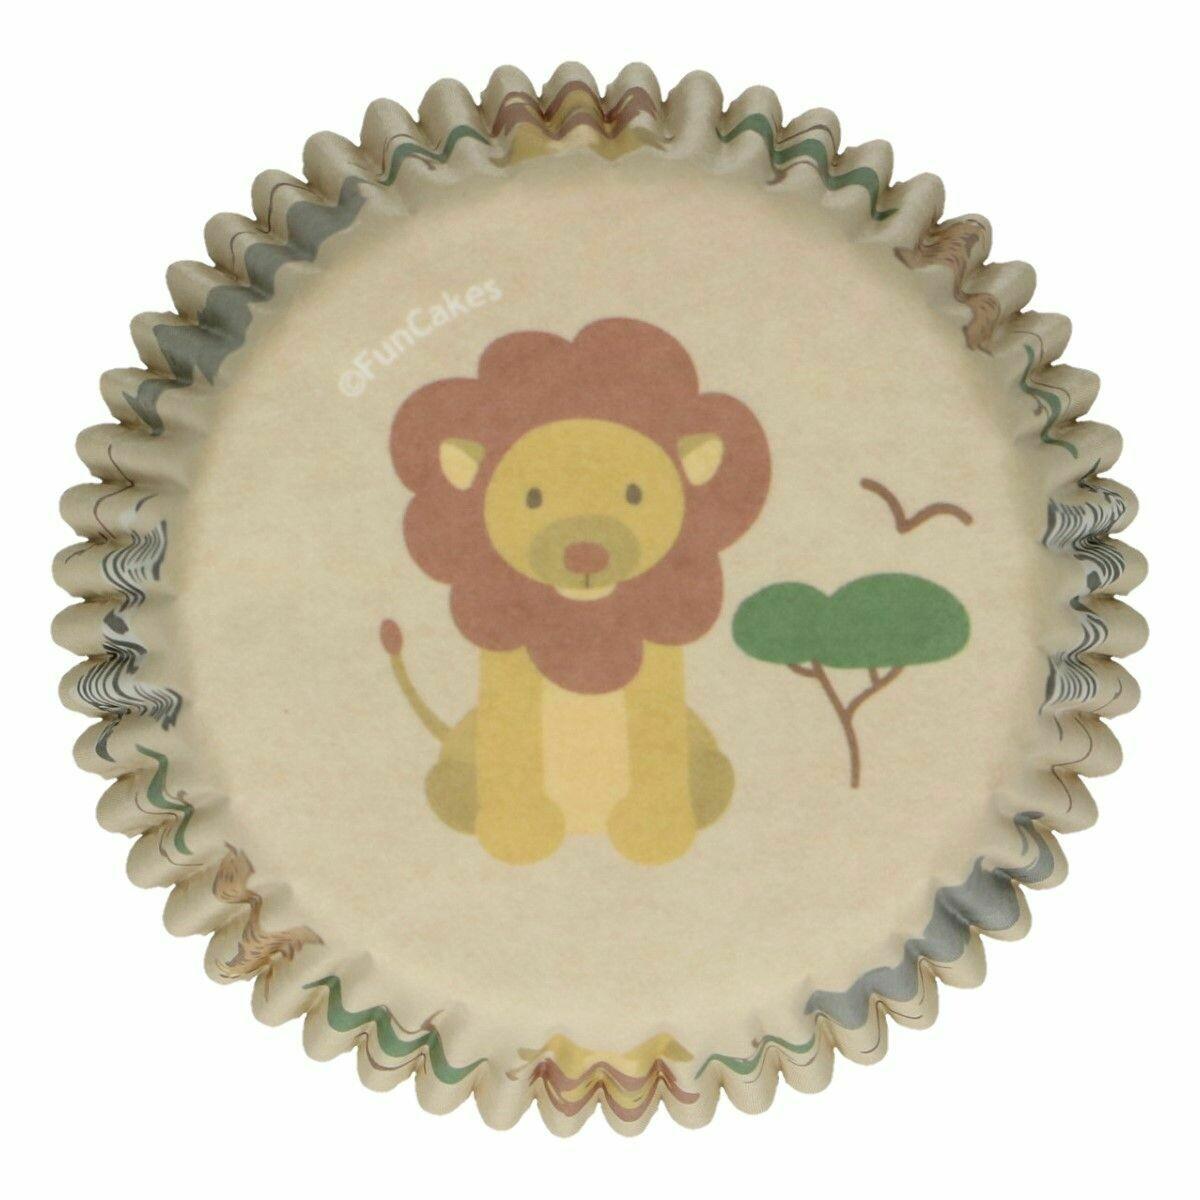 FunCakes Cupcake Cases -SAFARI ANIMALS -Θήκες Ψησίματος Ζώα Σαφάρι 48 τεμ